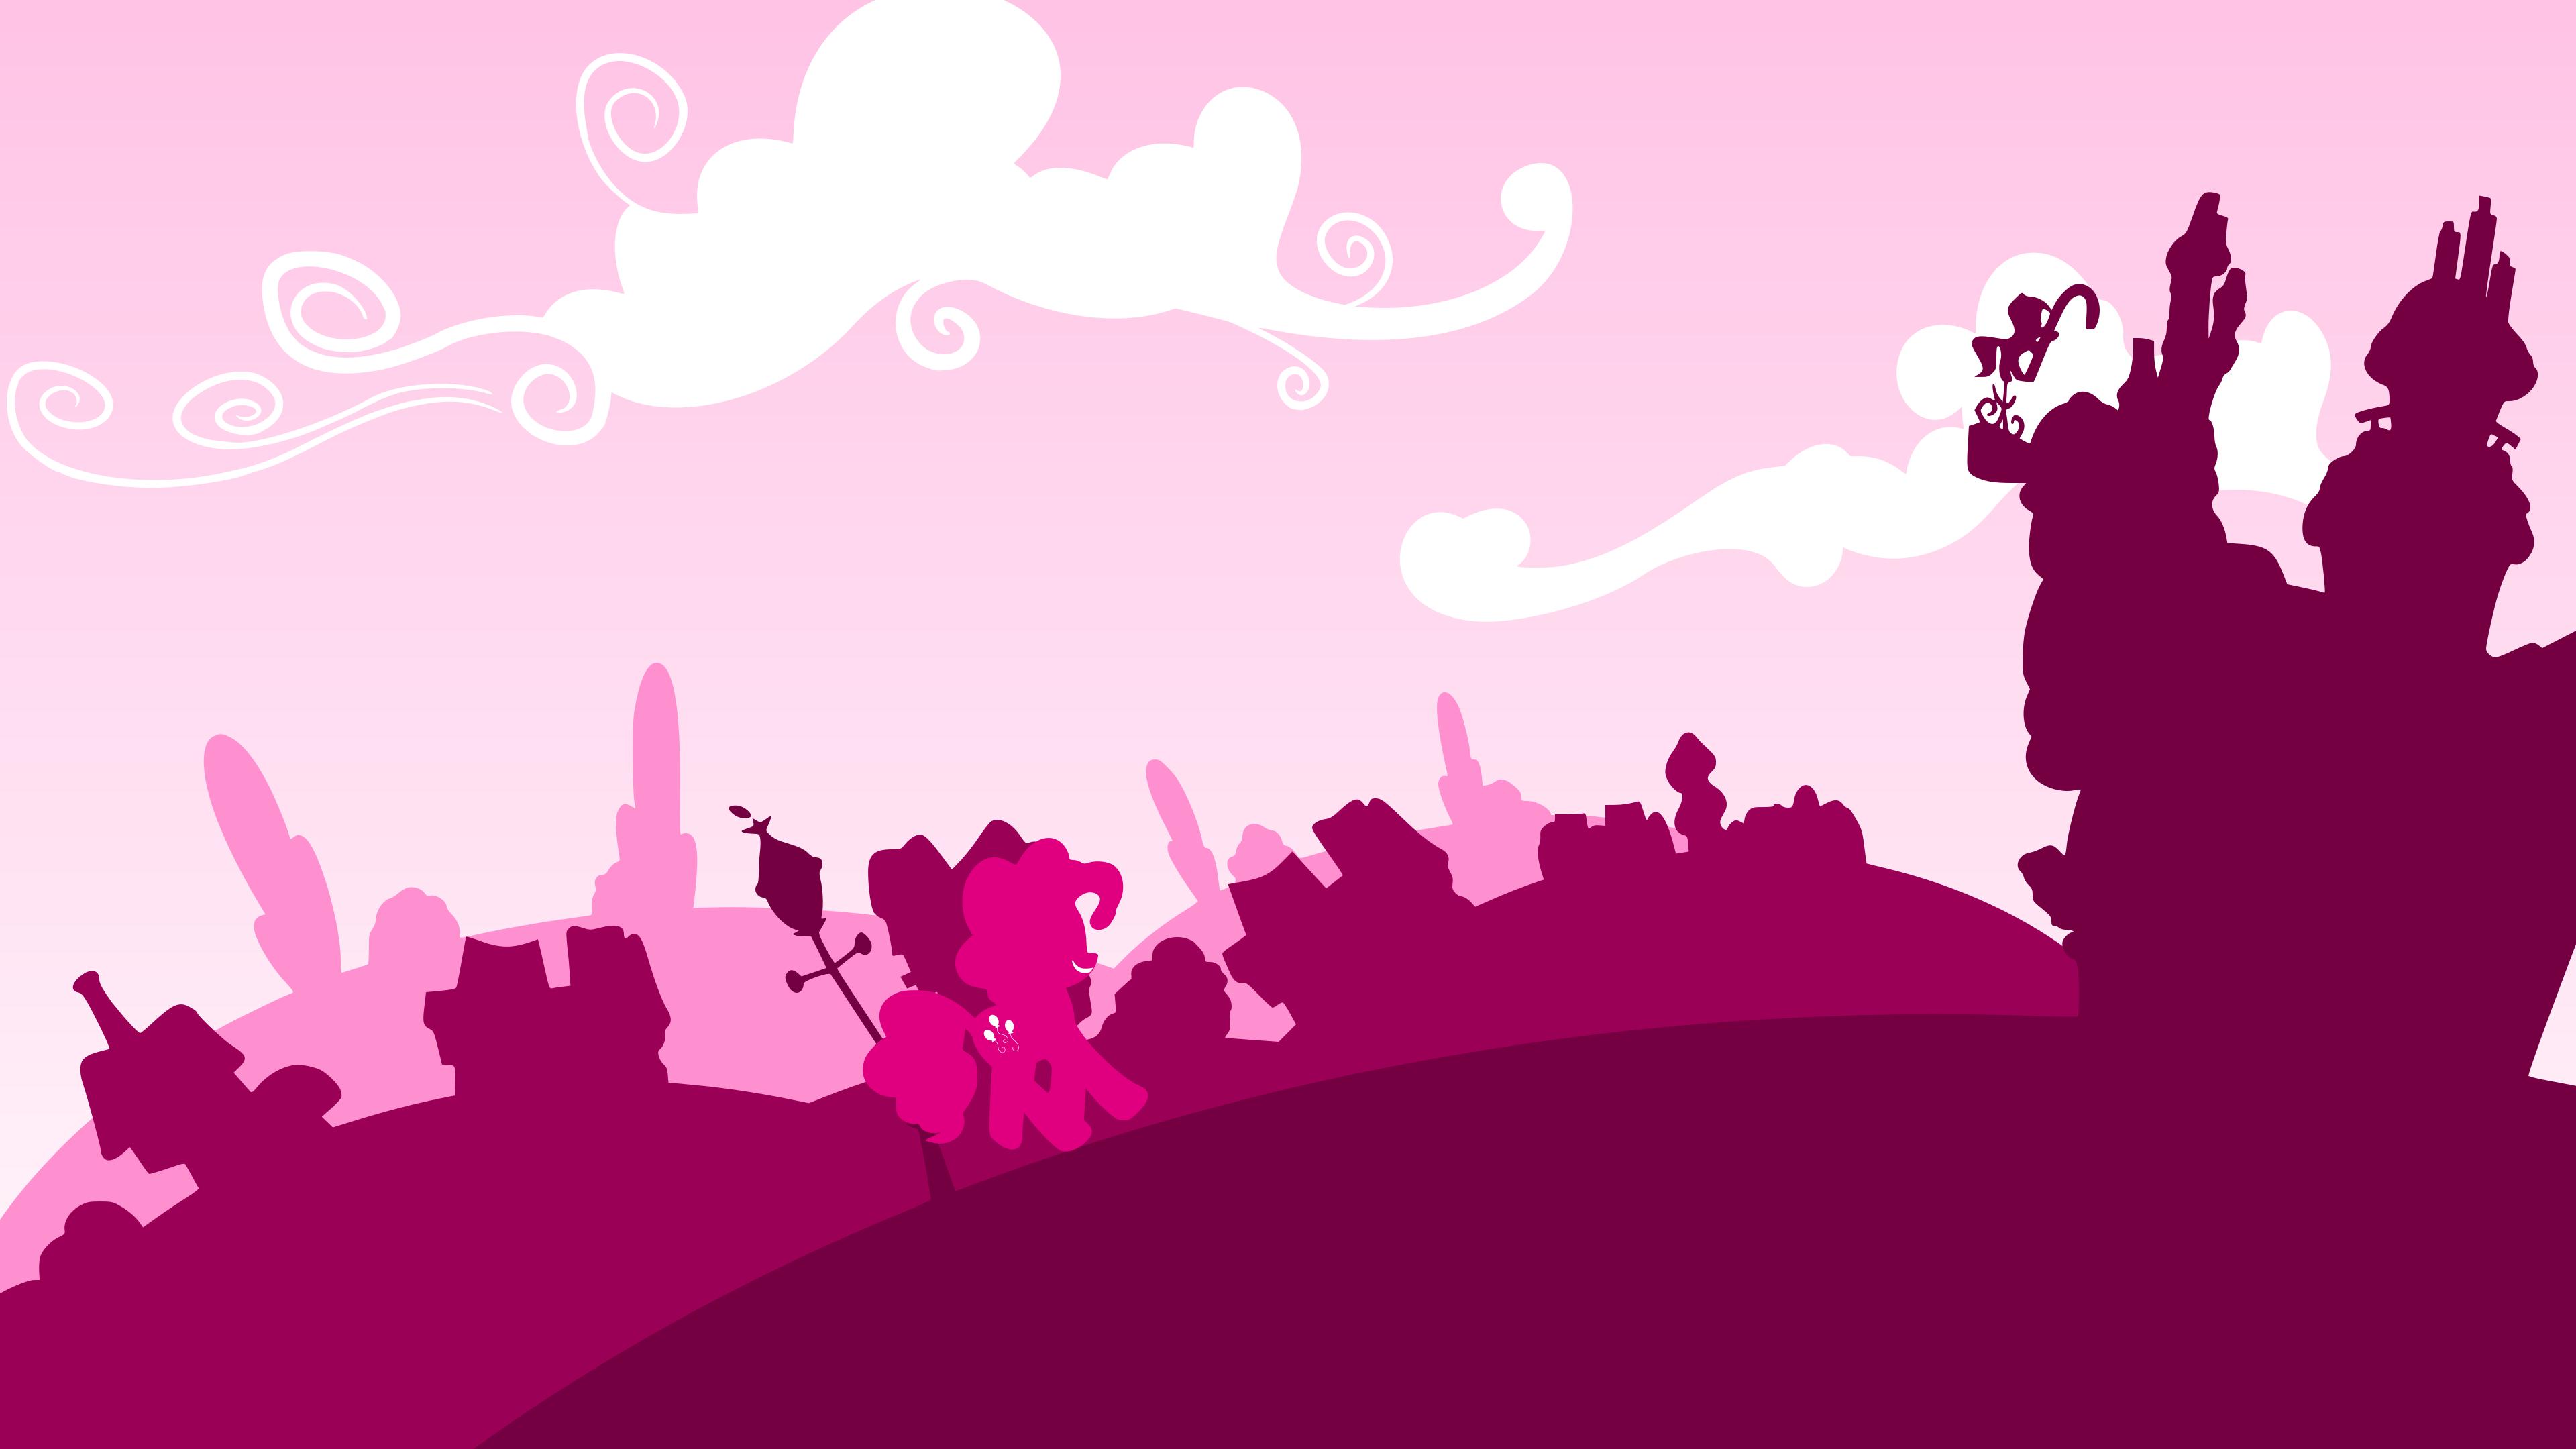 Pinkie Pie's Sweetacular Wallpaper by PhilipTomkins